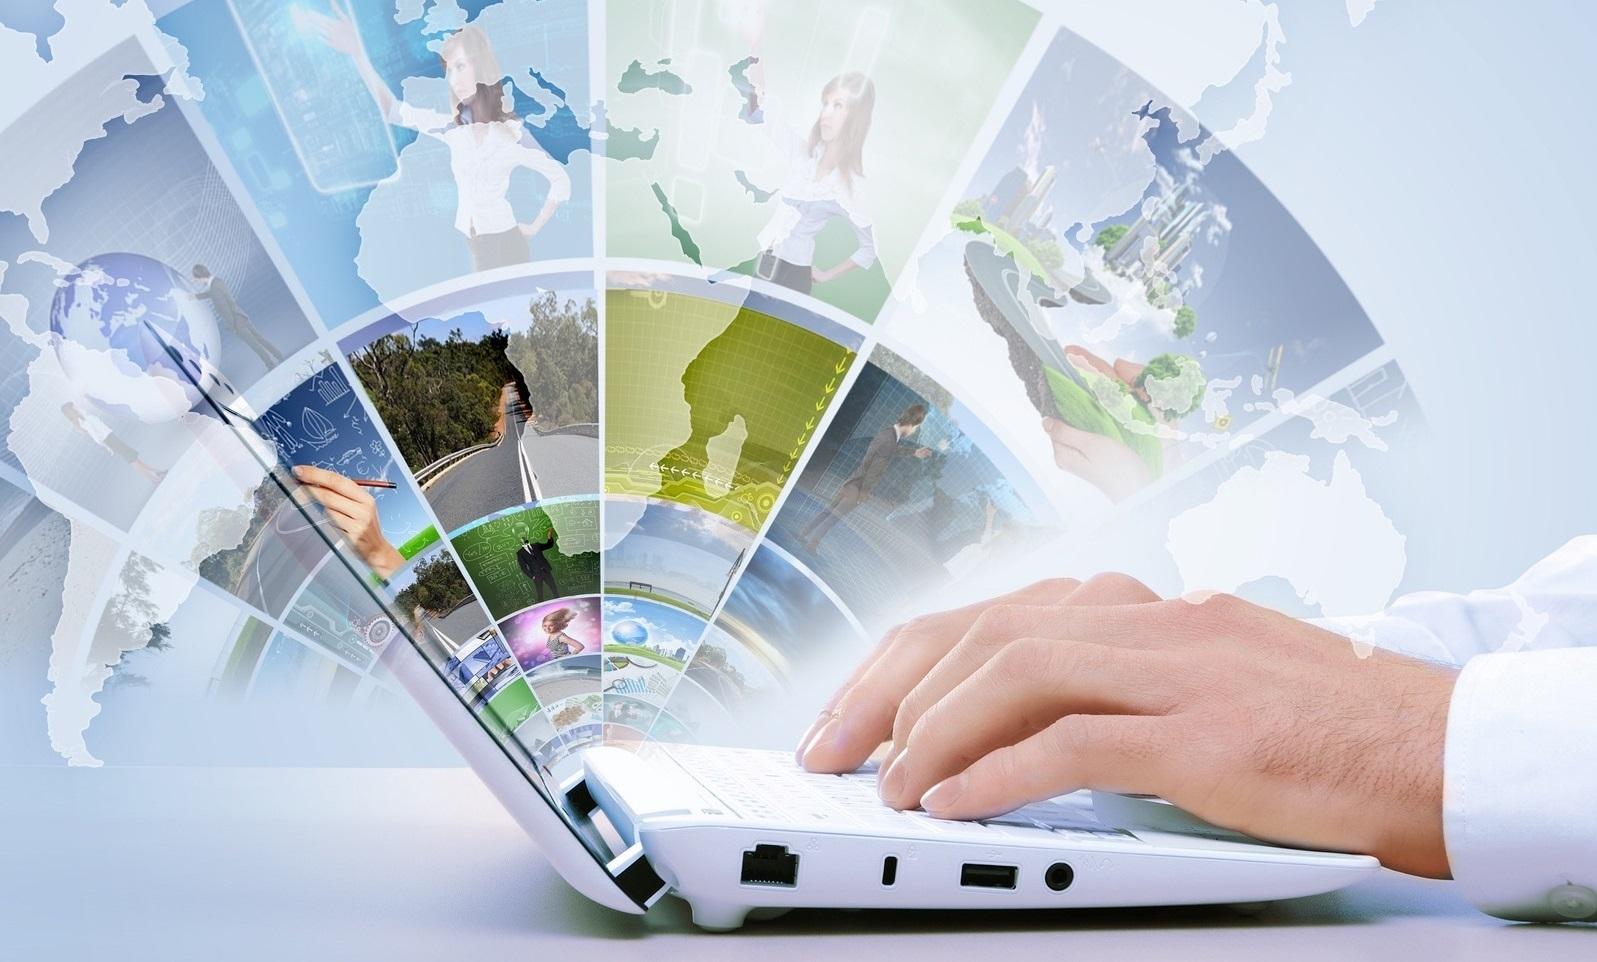 576594 ruki hi tech karta internet tehnologii noutbuk 3000x2250 www.GdeFon.ru  - Контент менеджер удаленно: что нужно знать?